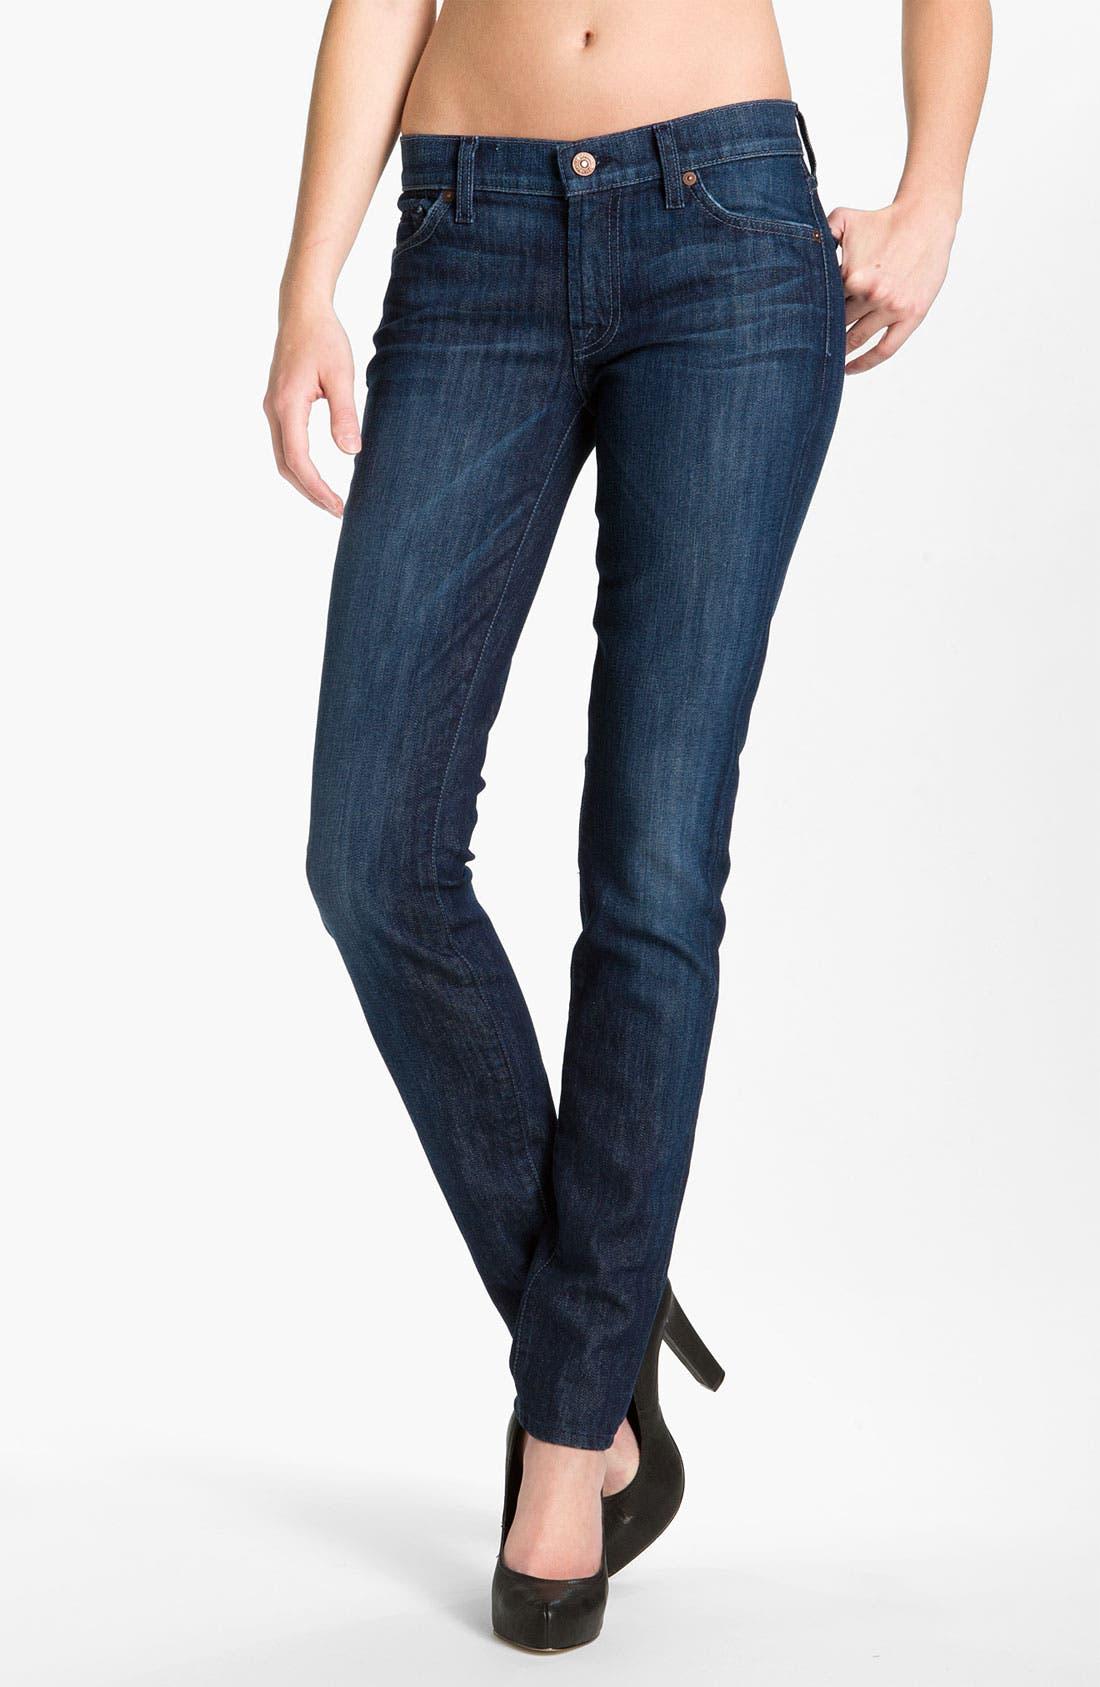 Main Image - 7 For All Mankind® 'Roxanne' Skinny Jeans (Summer Dusk)